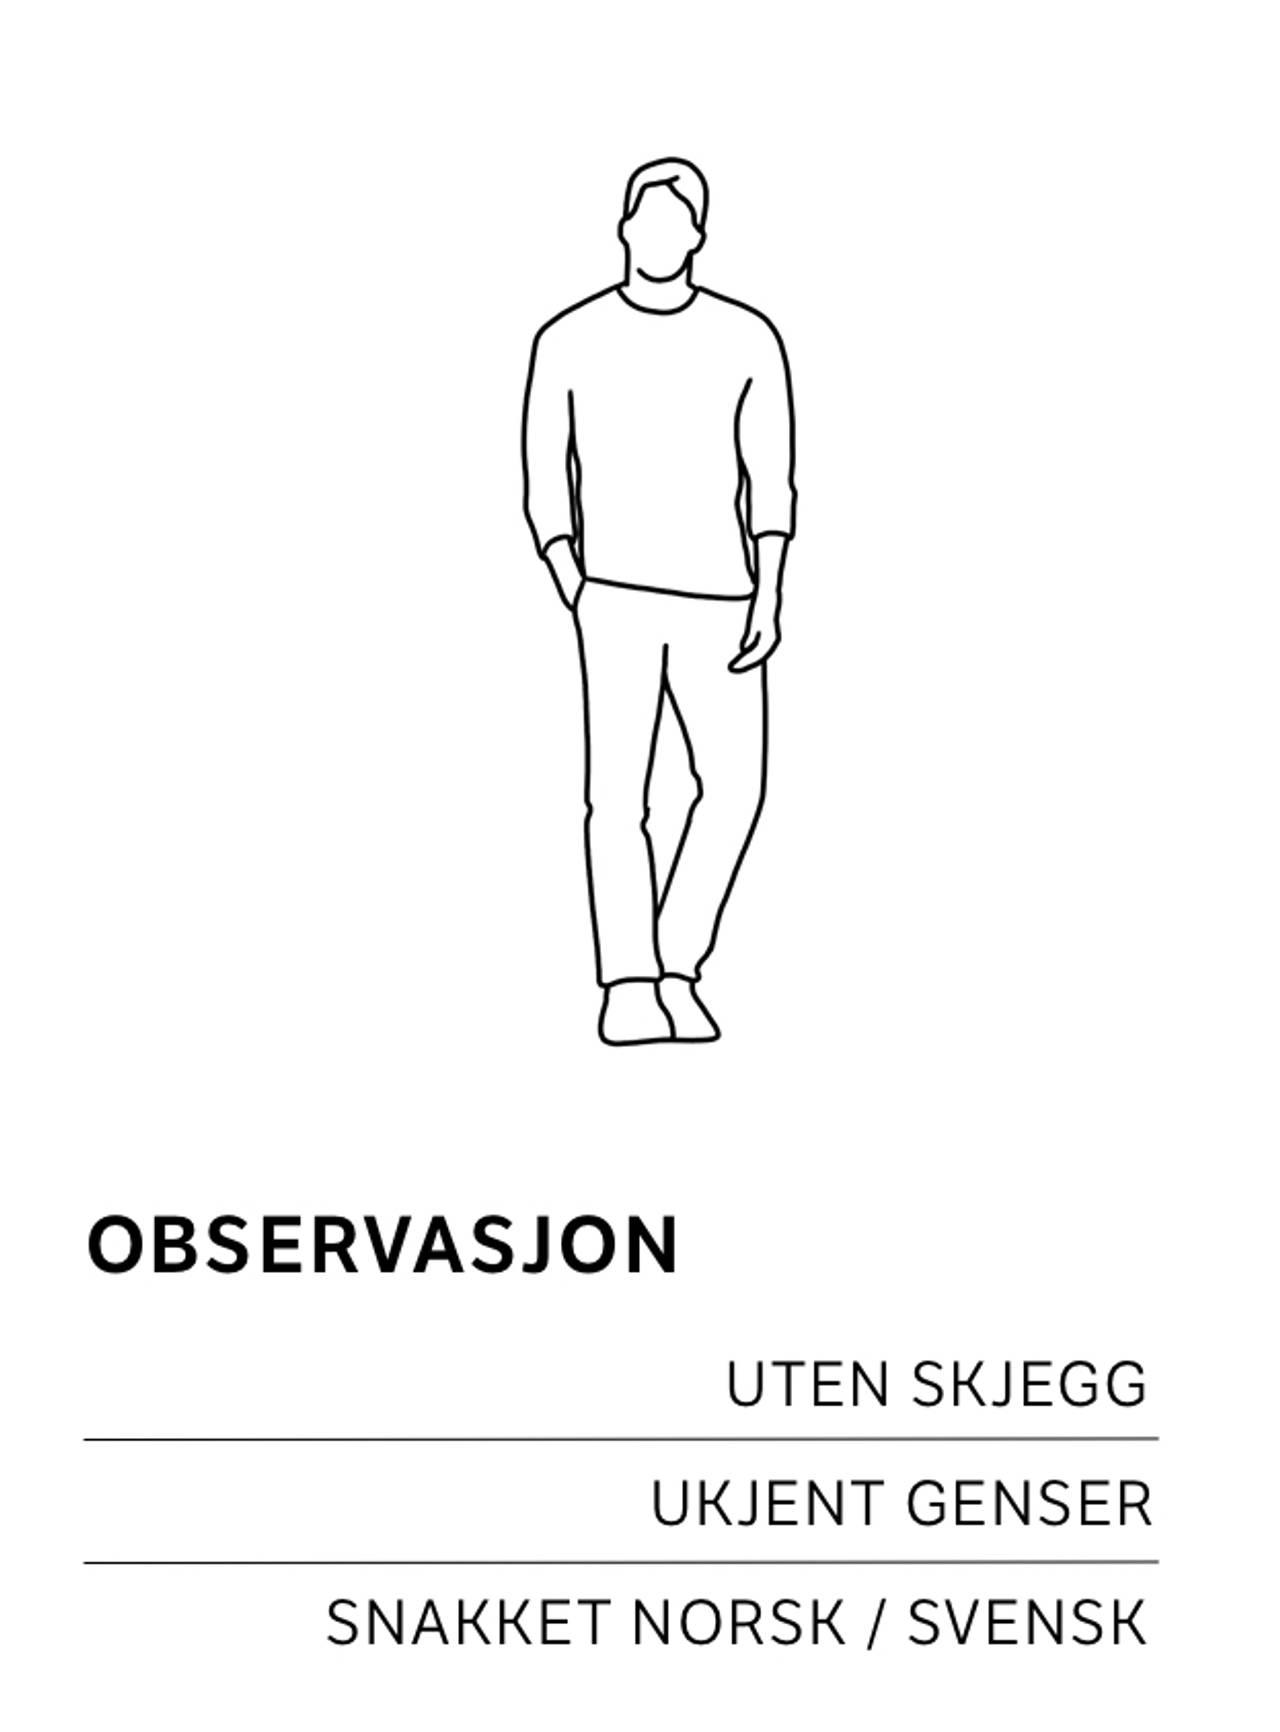 Mann uten genser